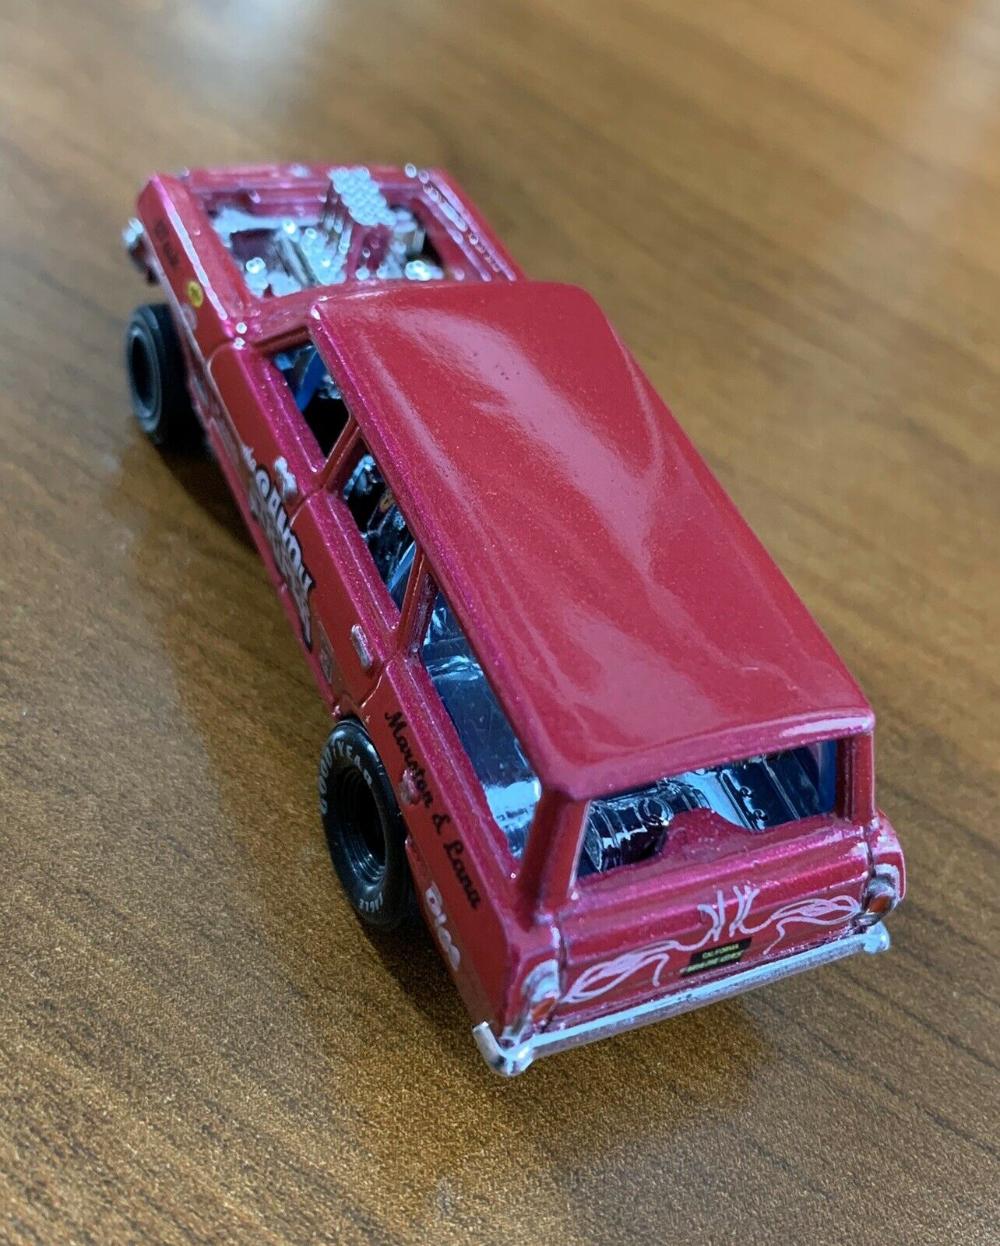 2020 Hot Wheels Custom Candy Striper '64 Nova Wagon Gasser